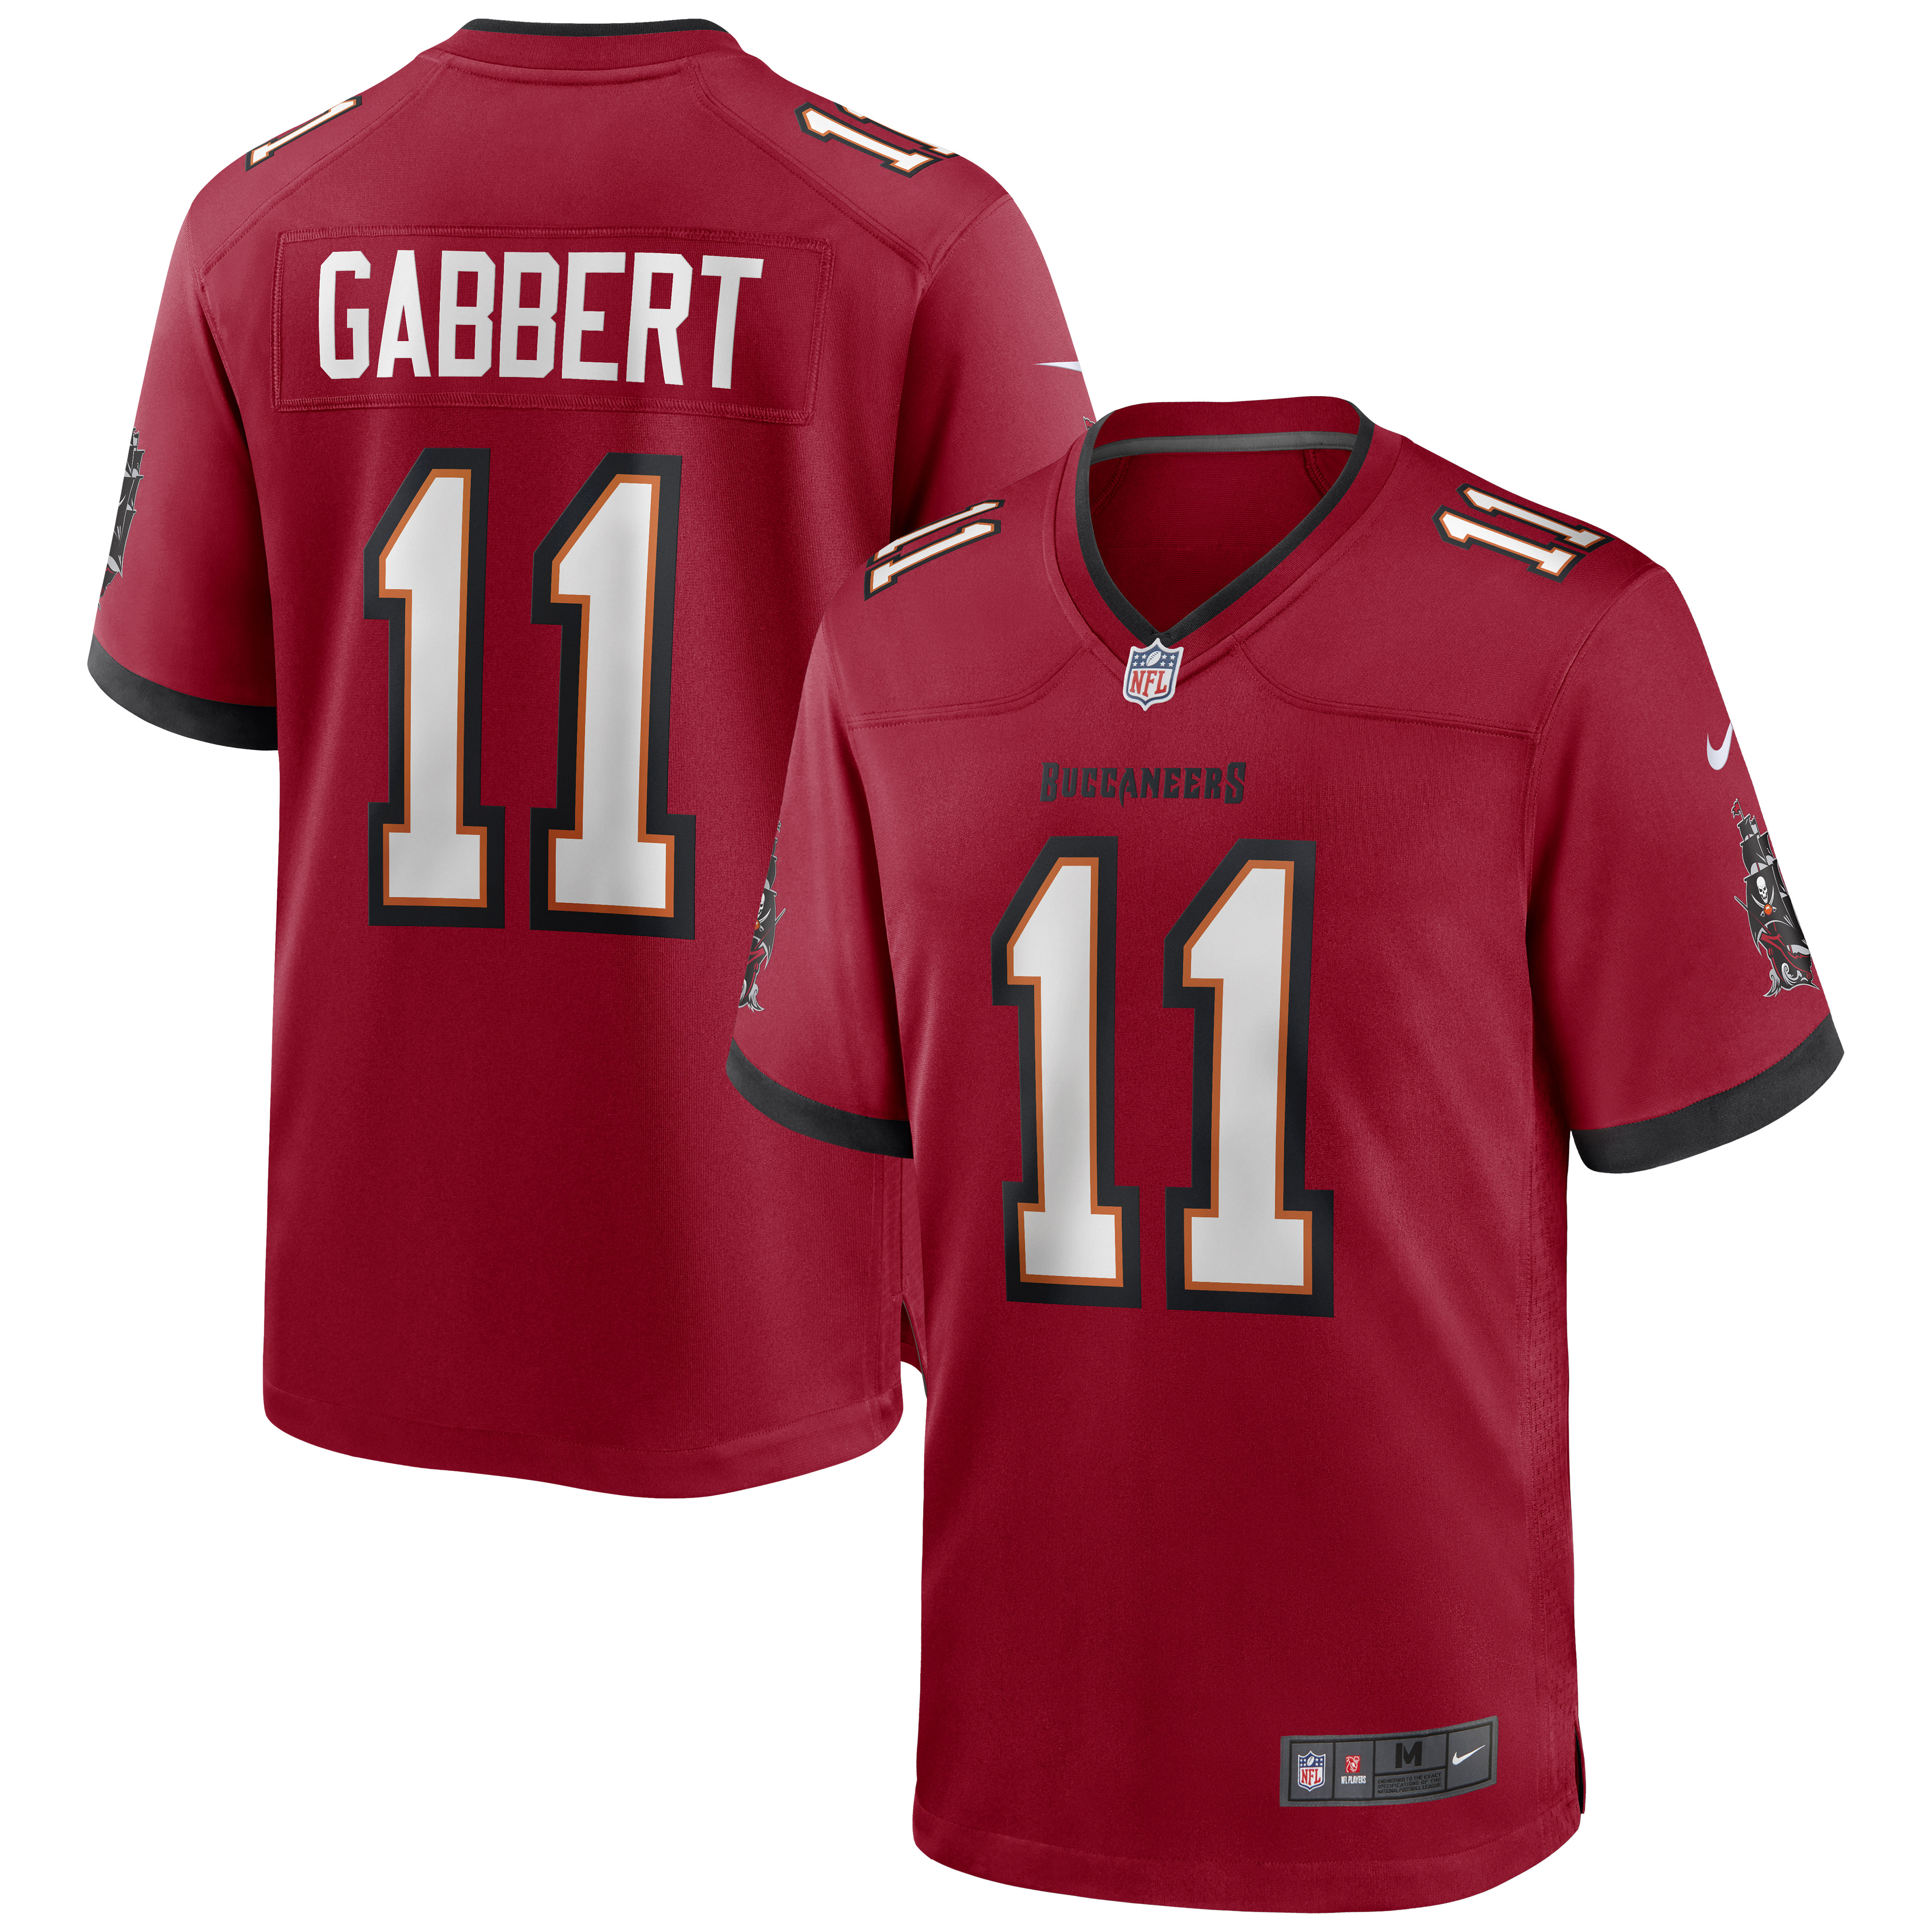 Blaine Gabbert Tampa Bay Buccaneers Nike Game Jersey - Red - Walmart.com